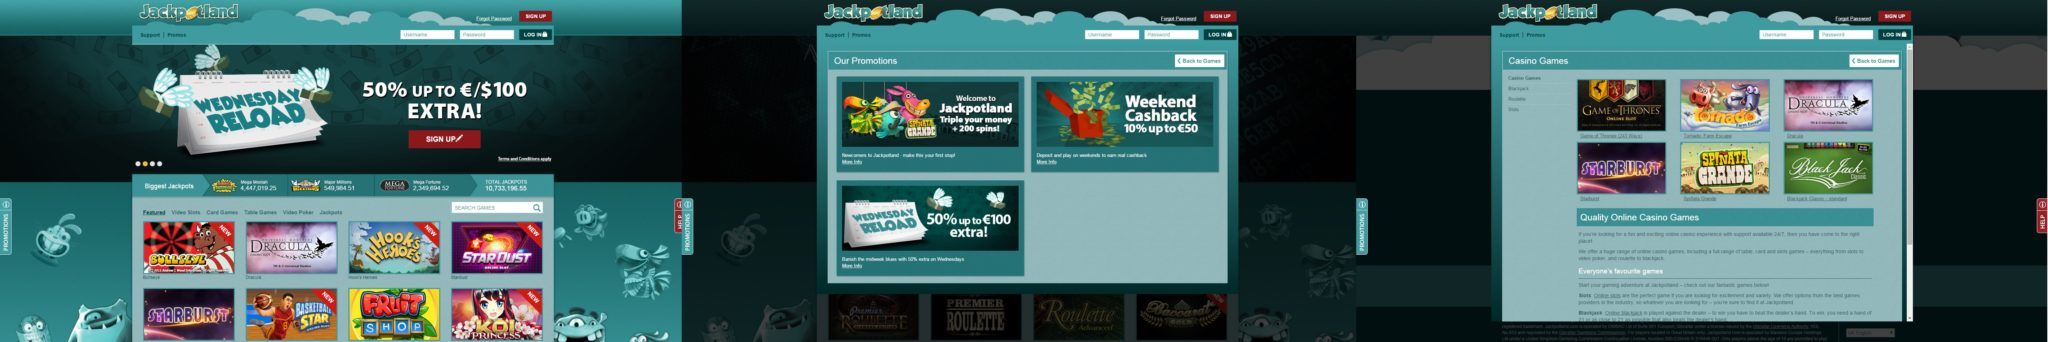 jackpotland casino_screens